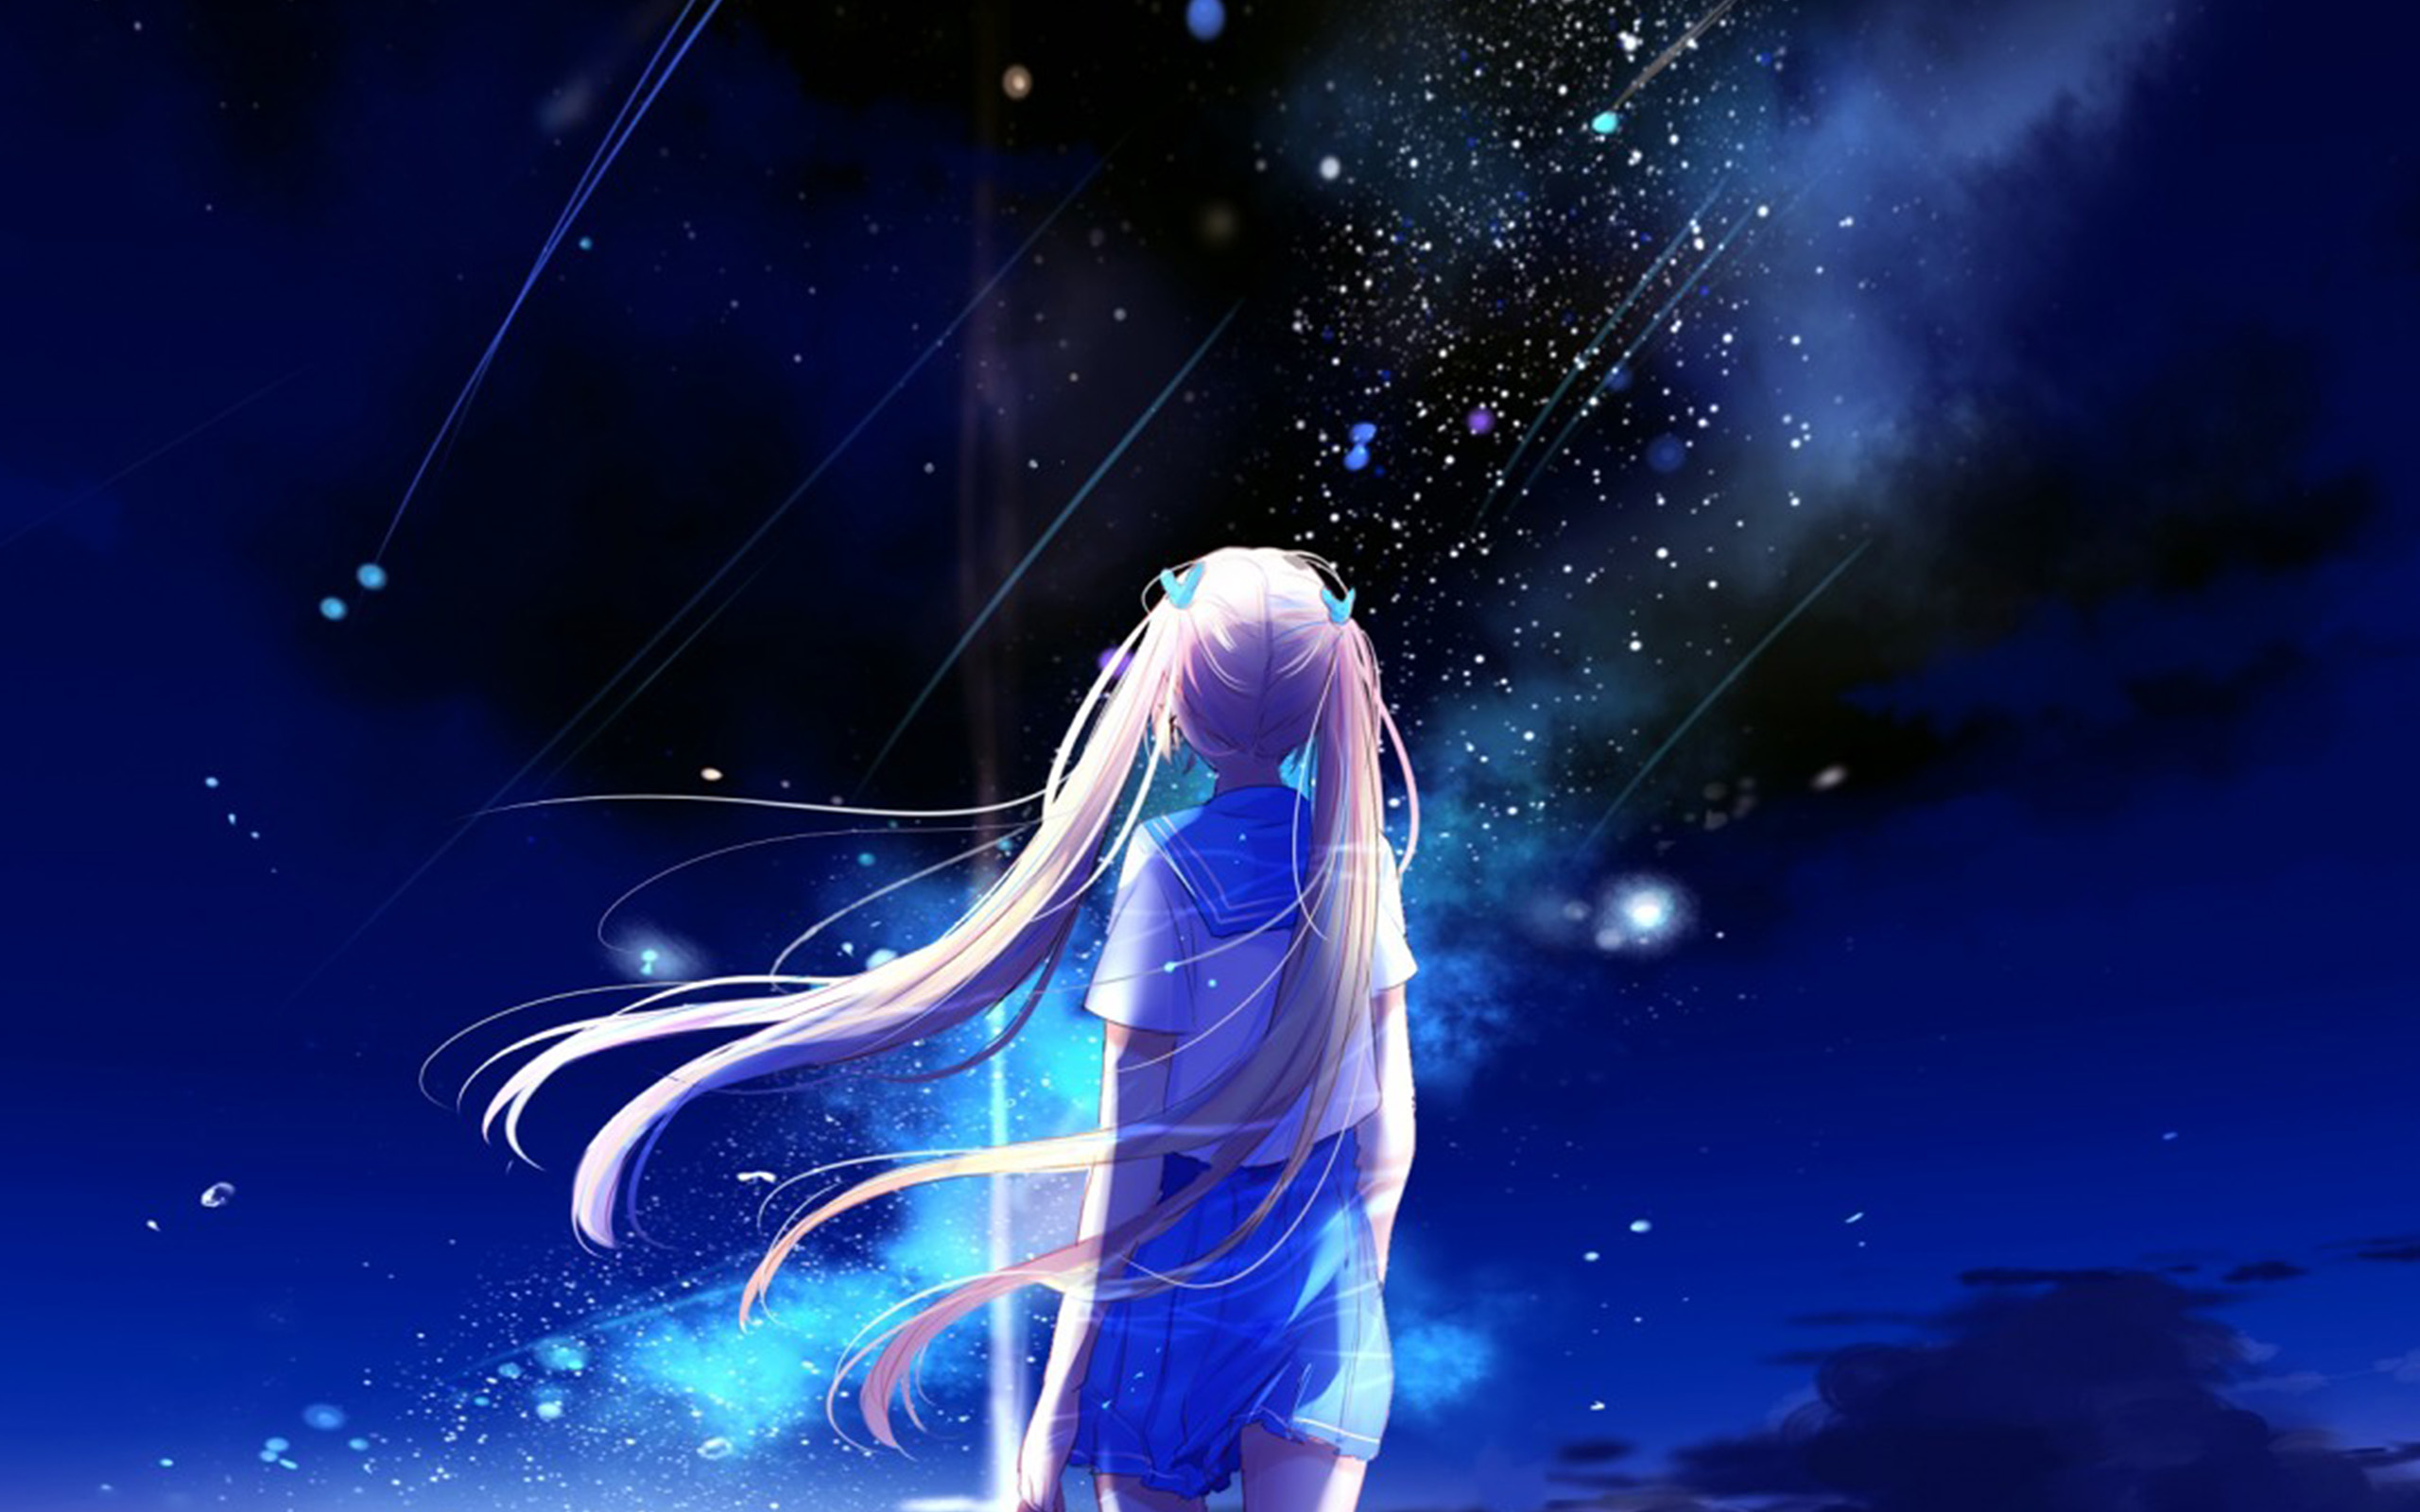 Animated Stars Wallpaper Bc64 Anime Night Space Star Art Illustration Wallpaper